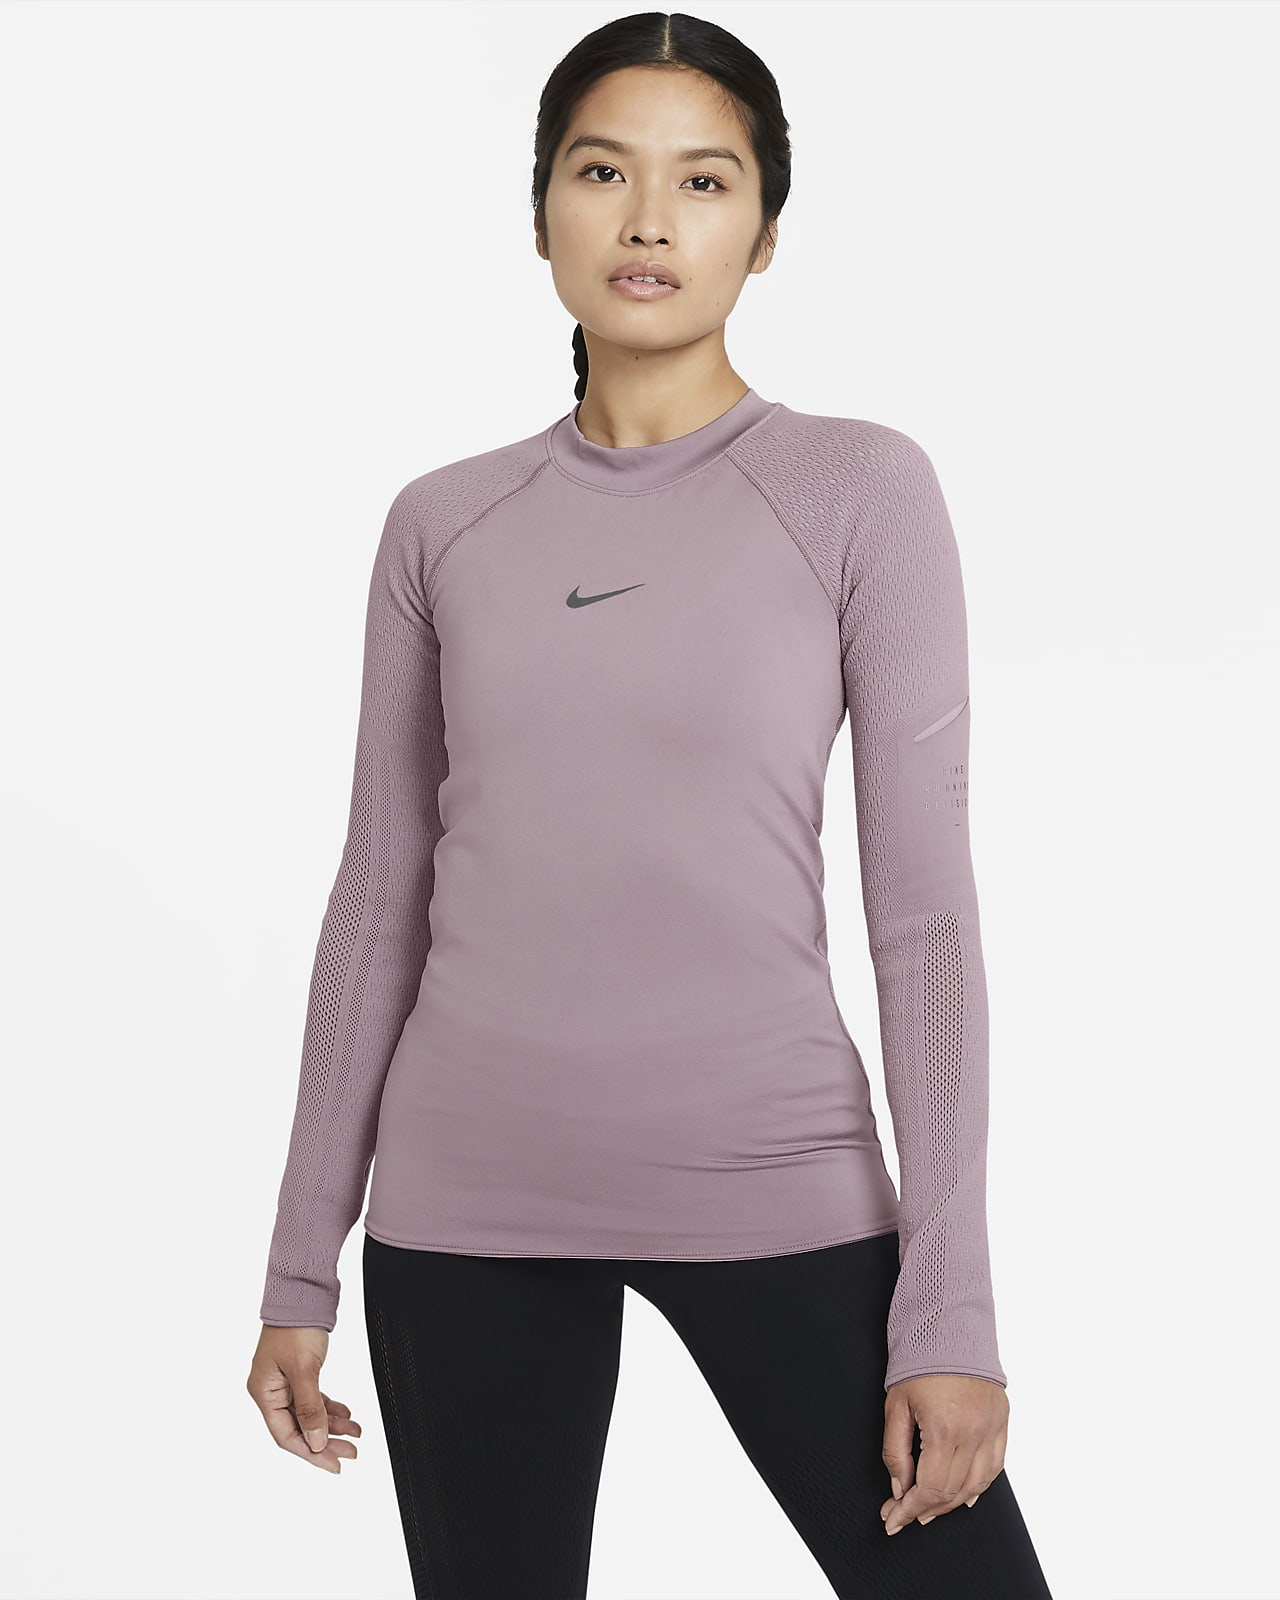 Nike Run Division Women's Engineered Knit Running Top